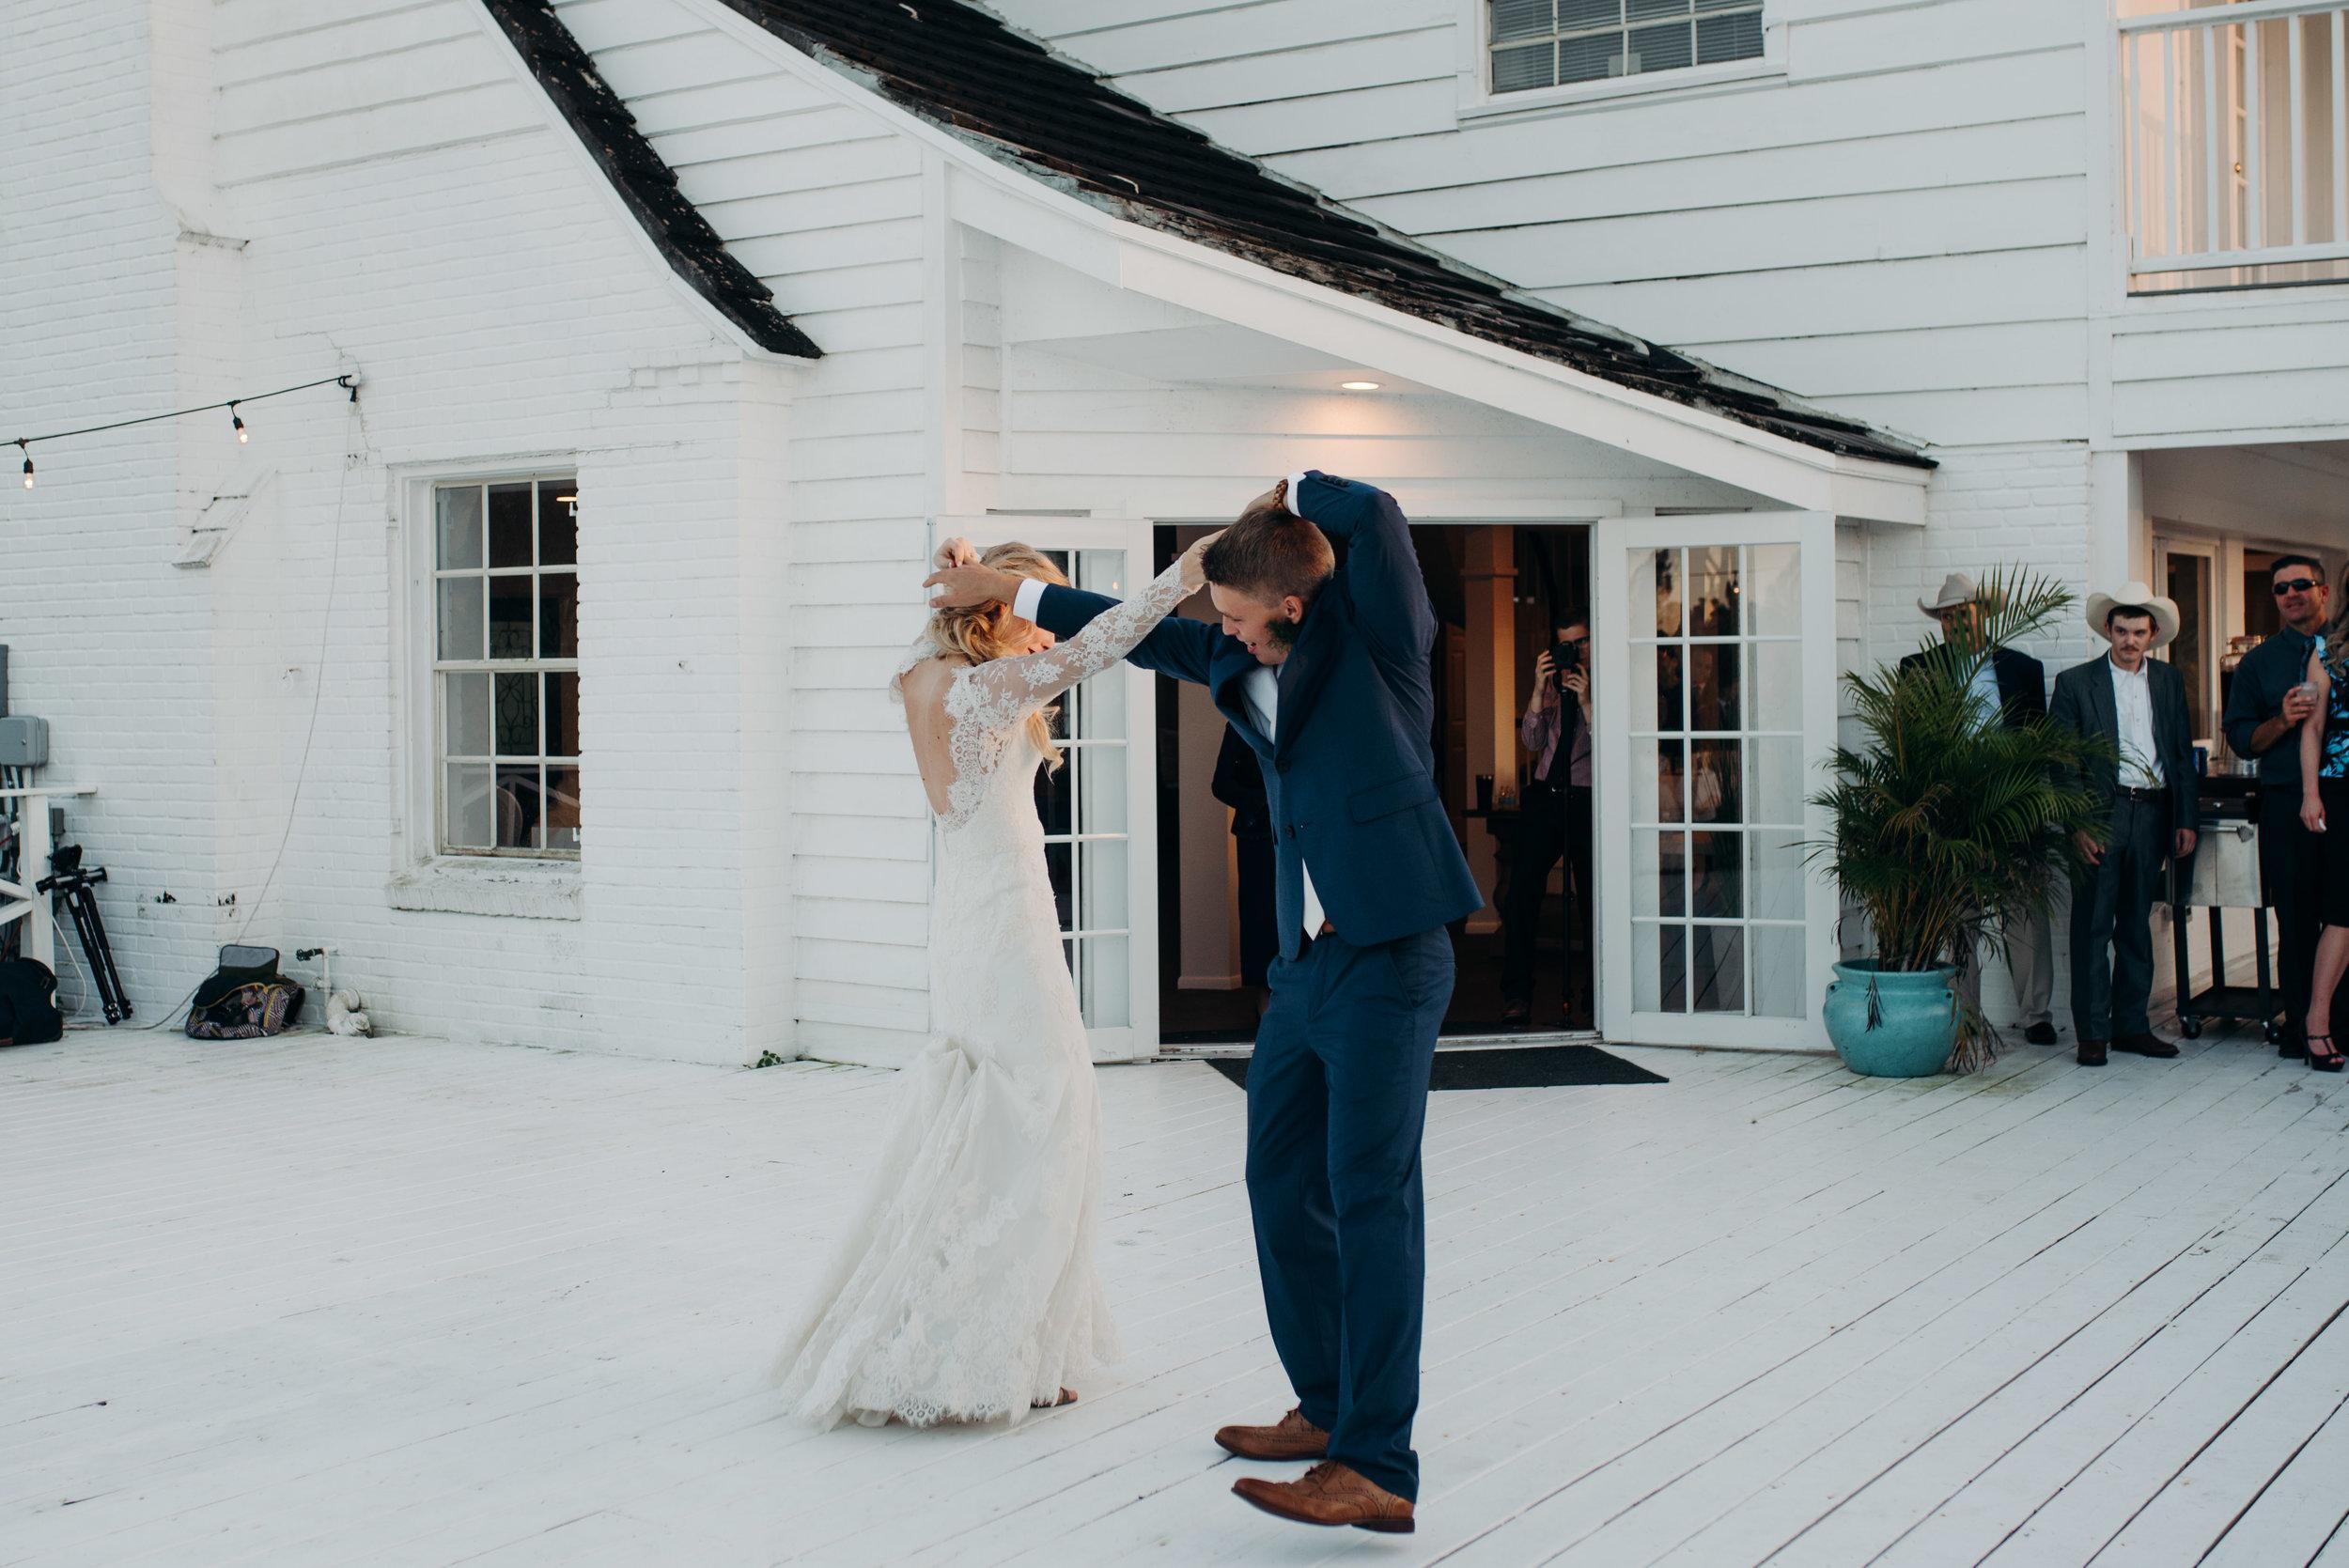 micayla-greyson-neumann-vero-beach-lake-house-winter-white-wedding-photography-943.jpg